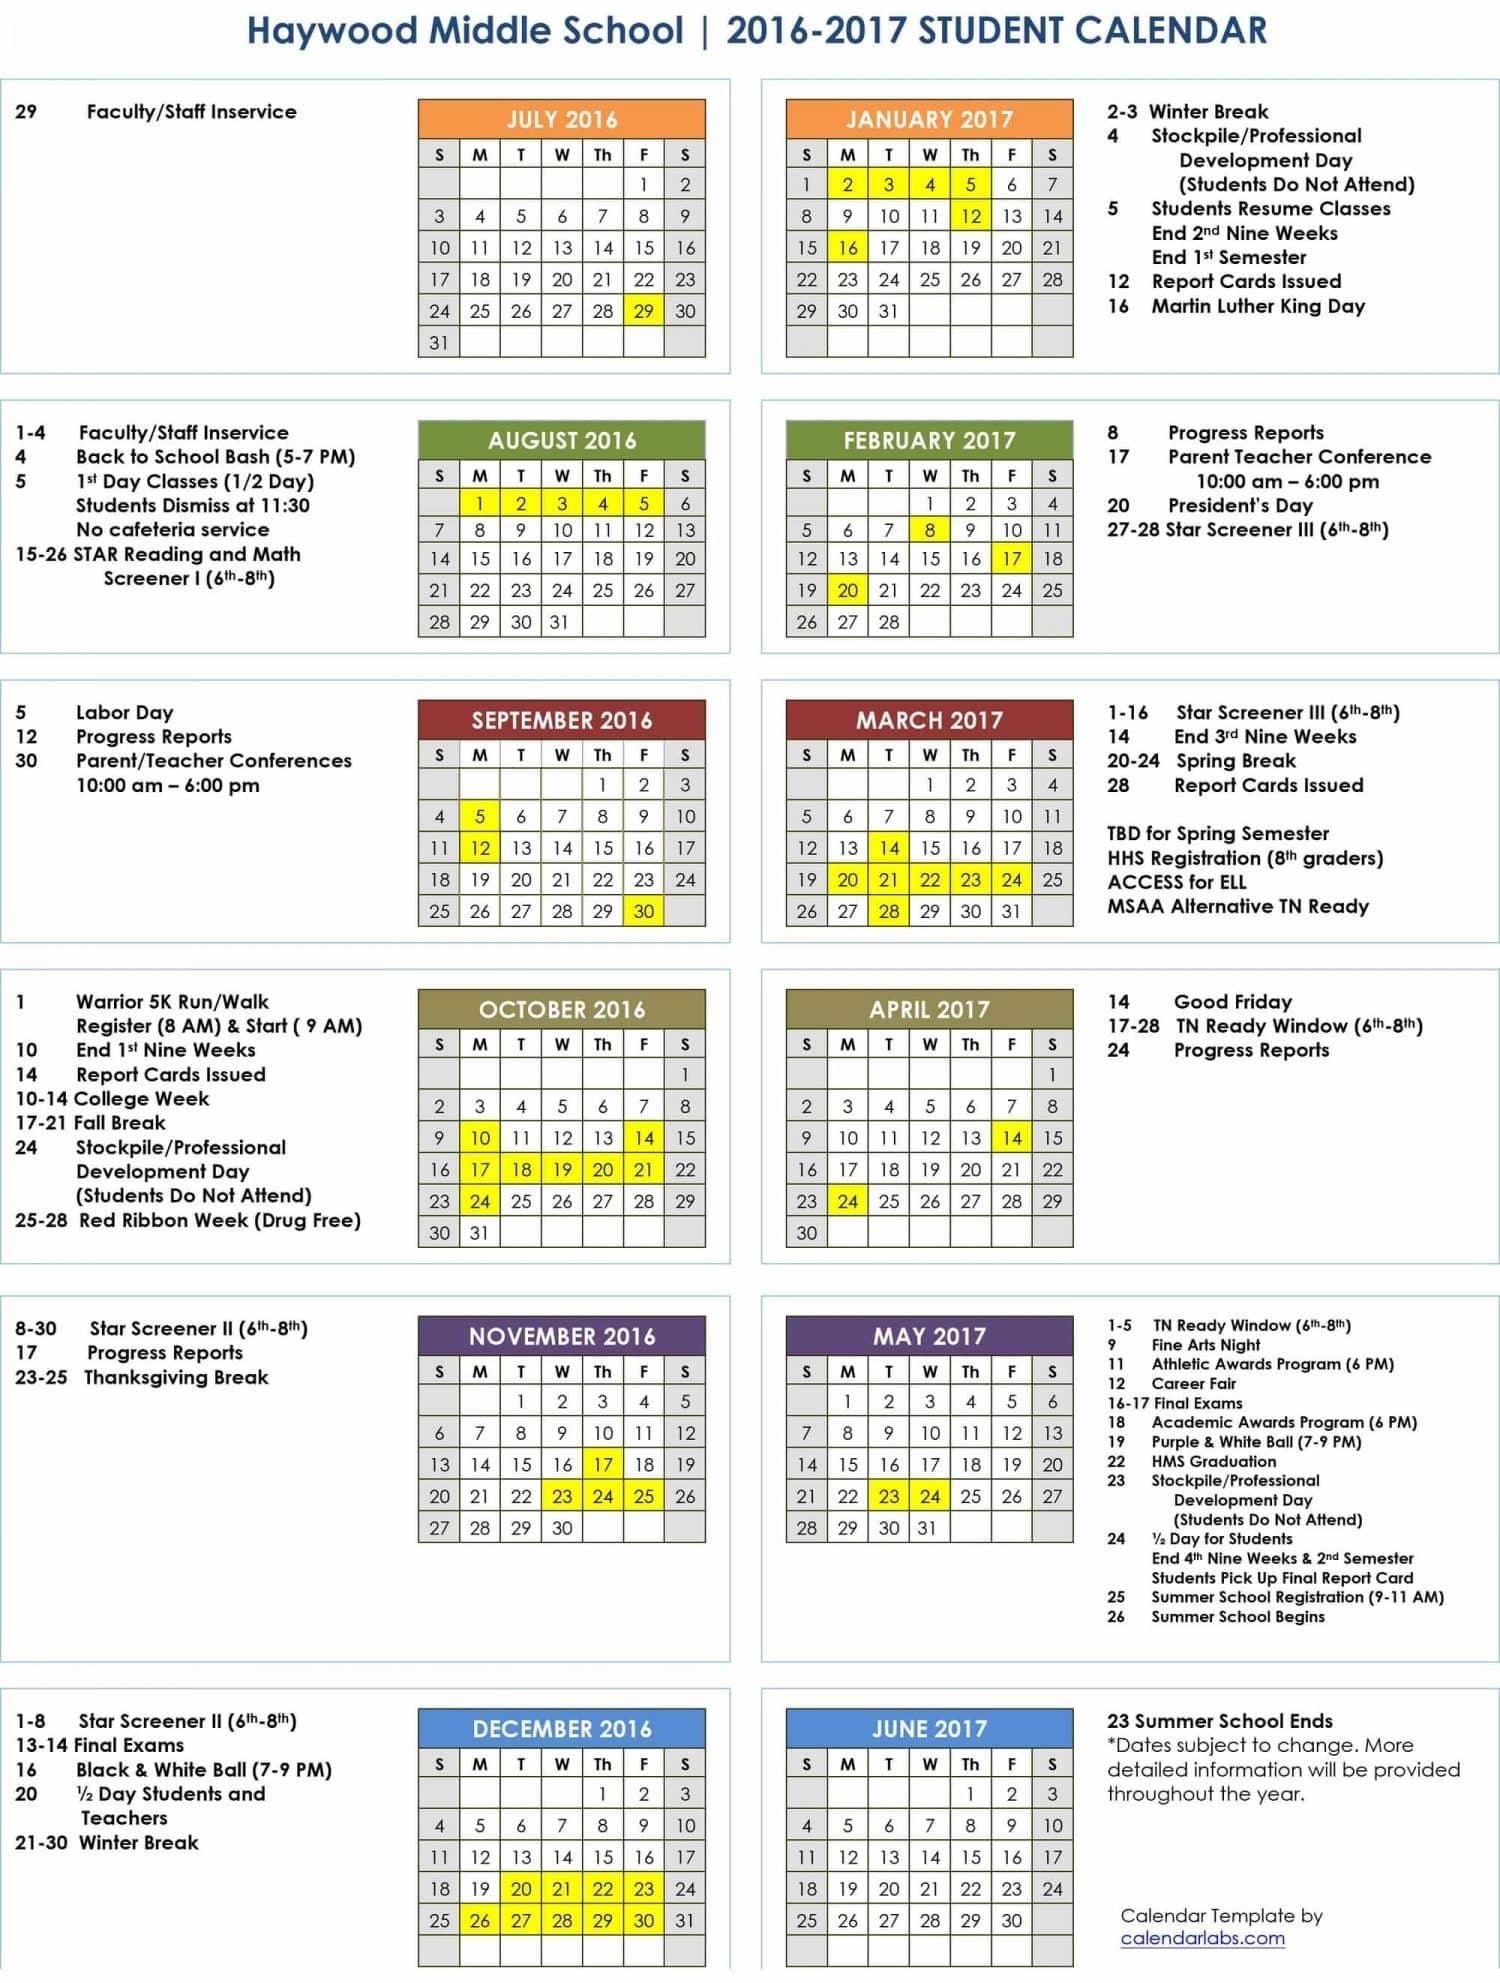 Microsoft Word - 2016-2017 HMS Calendar.Student.doc